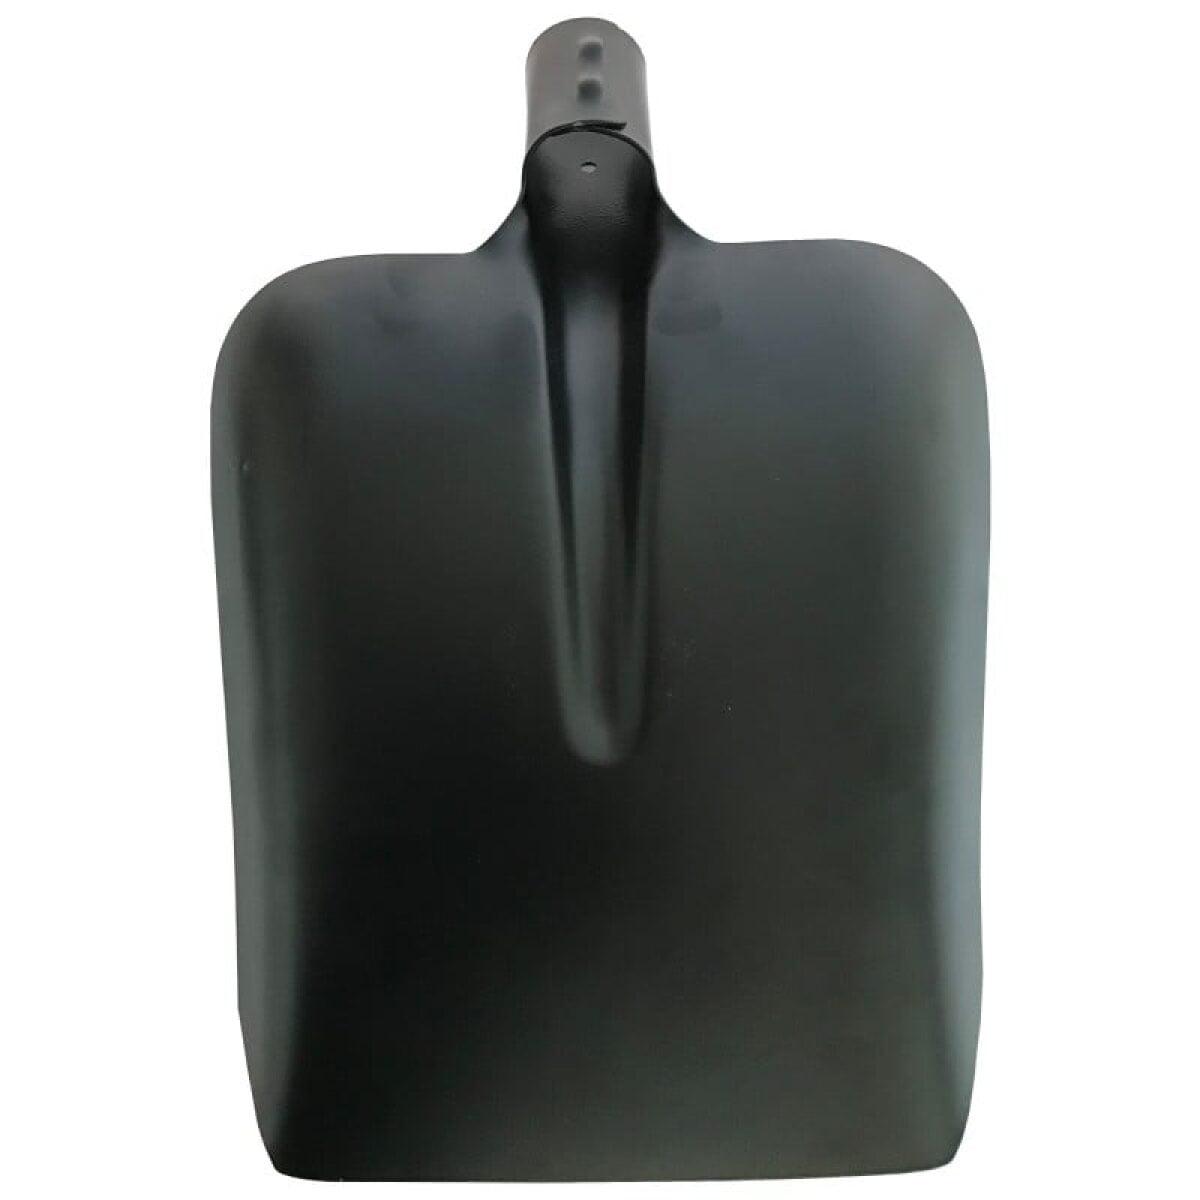 lopata patrata s551 2 270x233 mm tip c ng ii padure gardina.ro 67